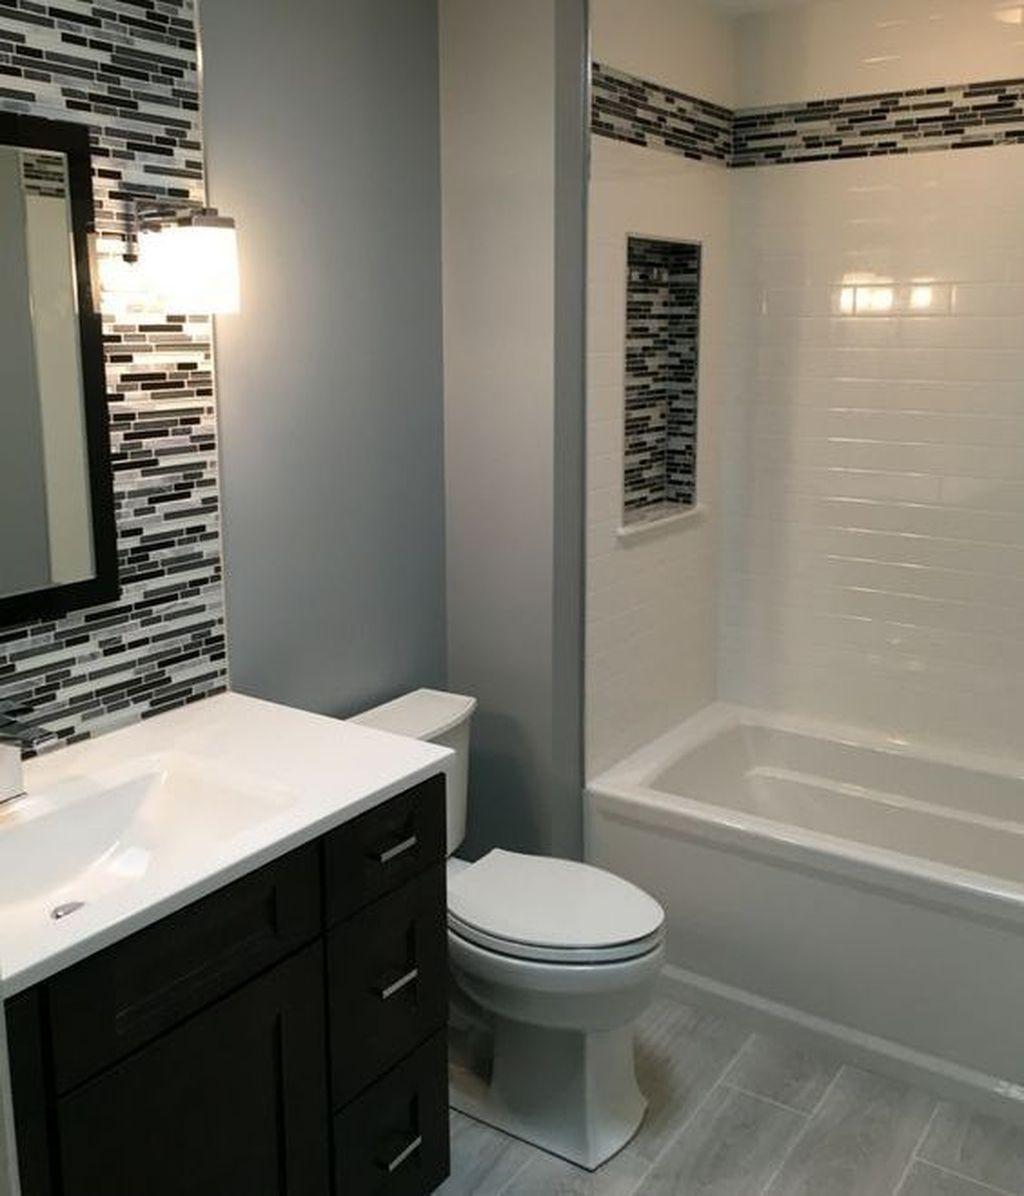 Delightful Bathroom Decoration Inspirations Ideas 36 Small Bathroom Remodel Small Bathroom Bathroom Decor